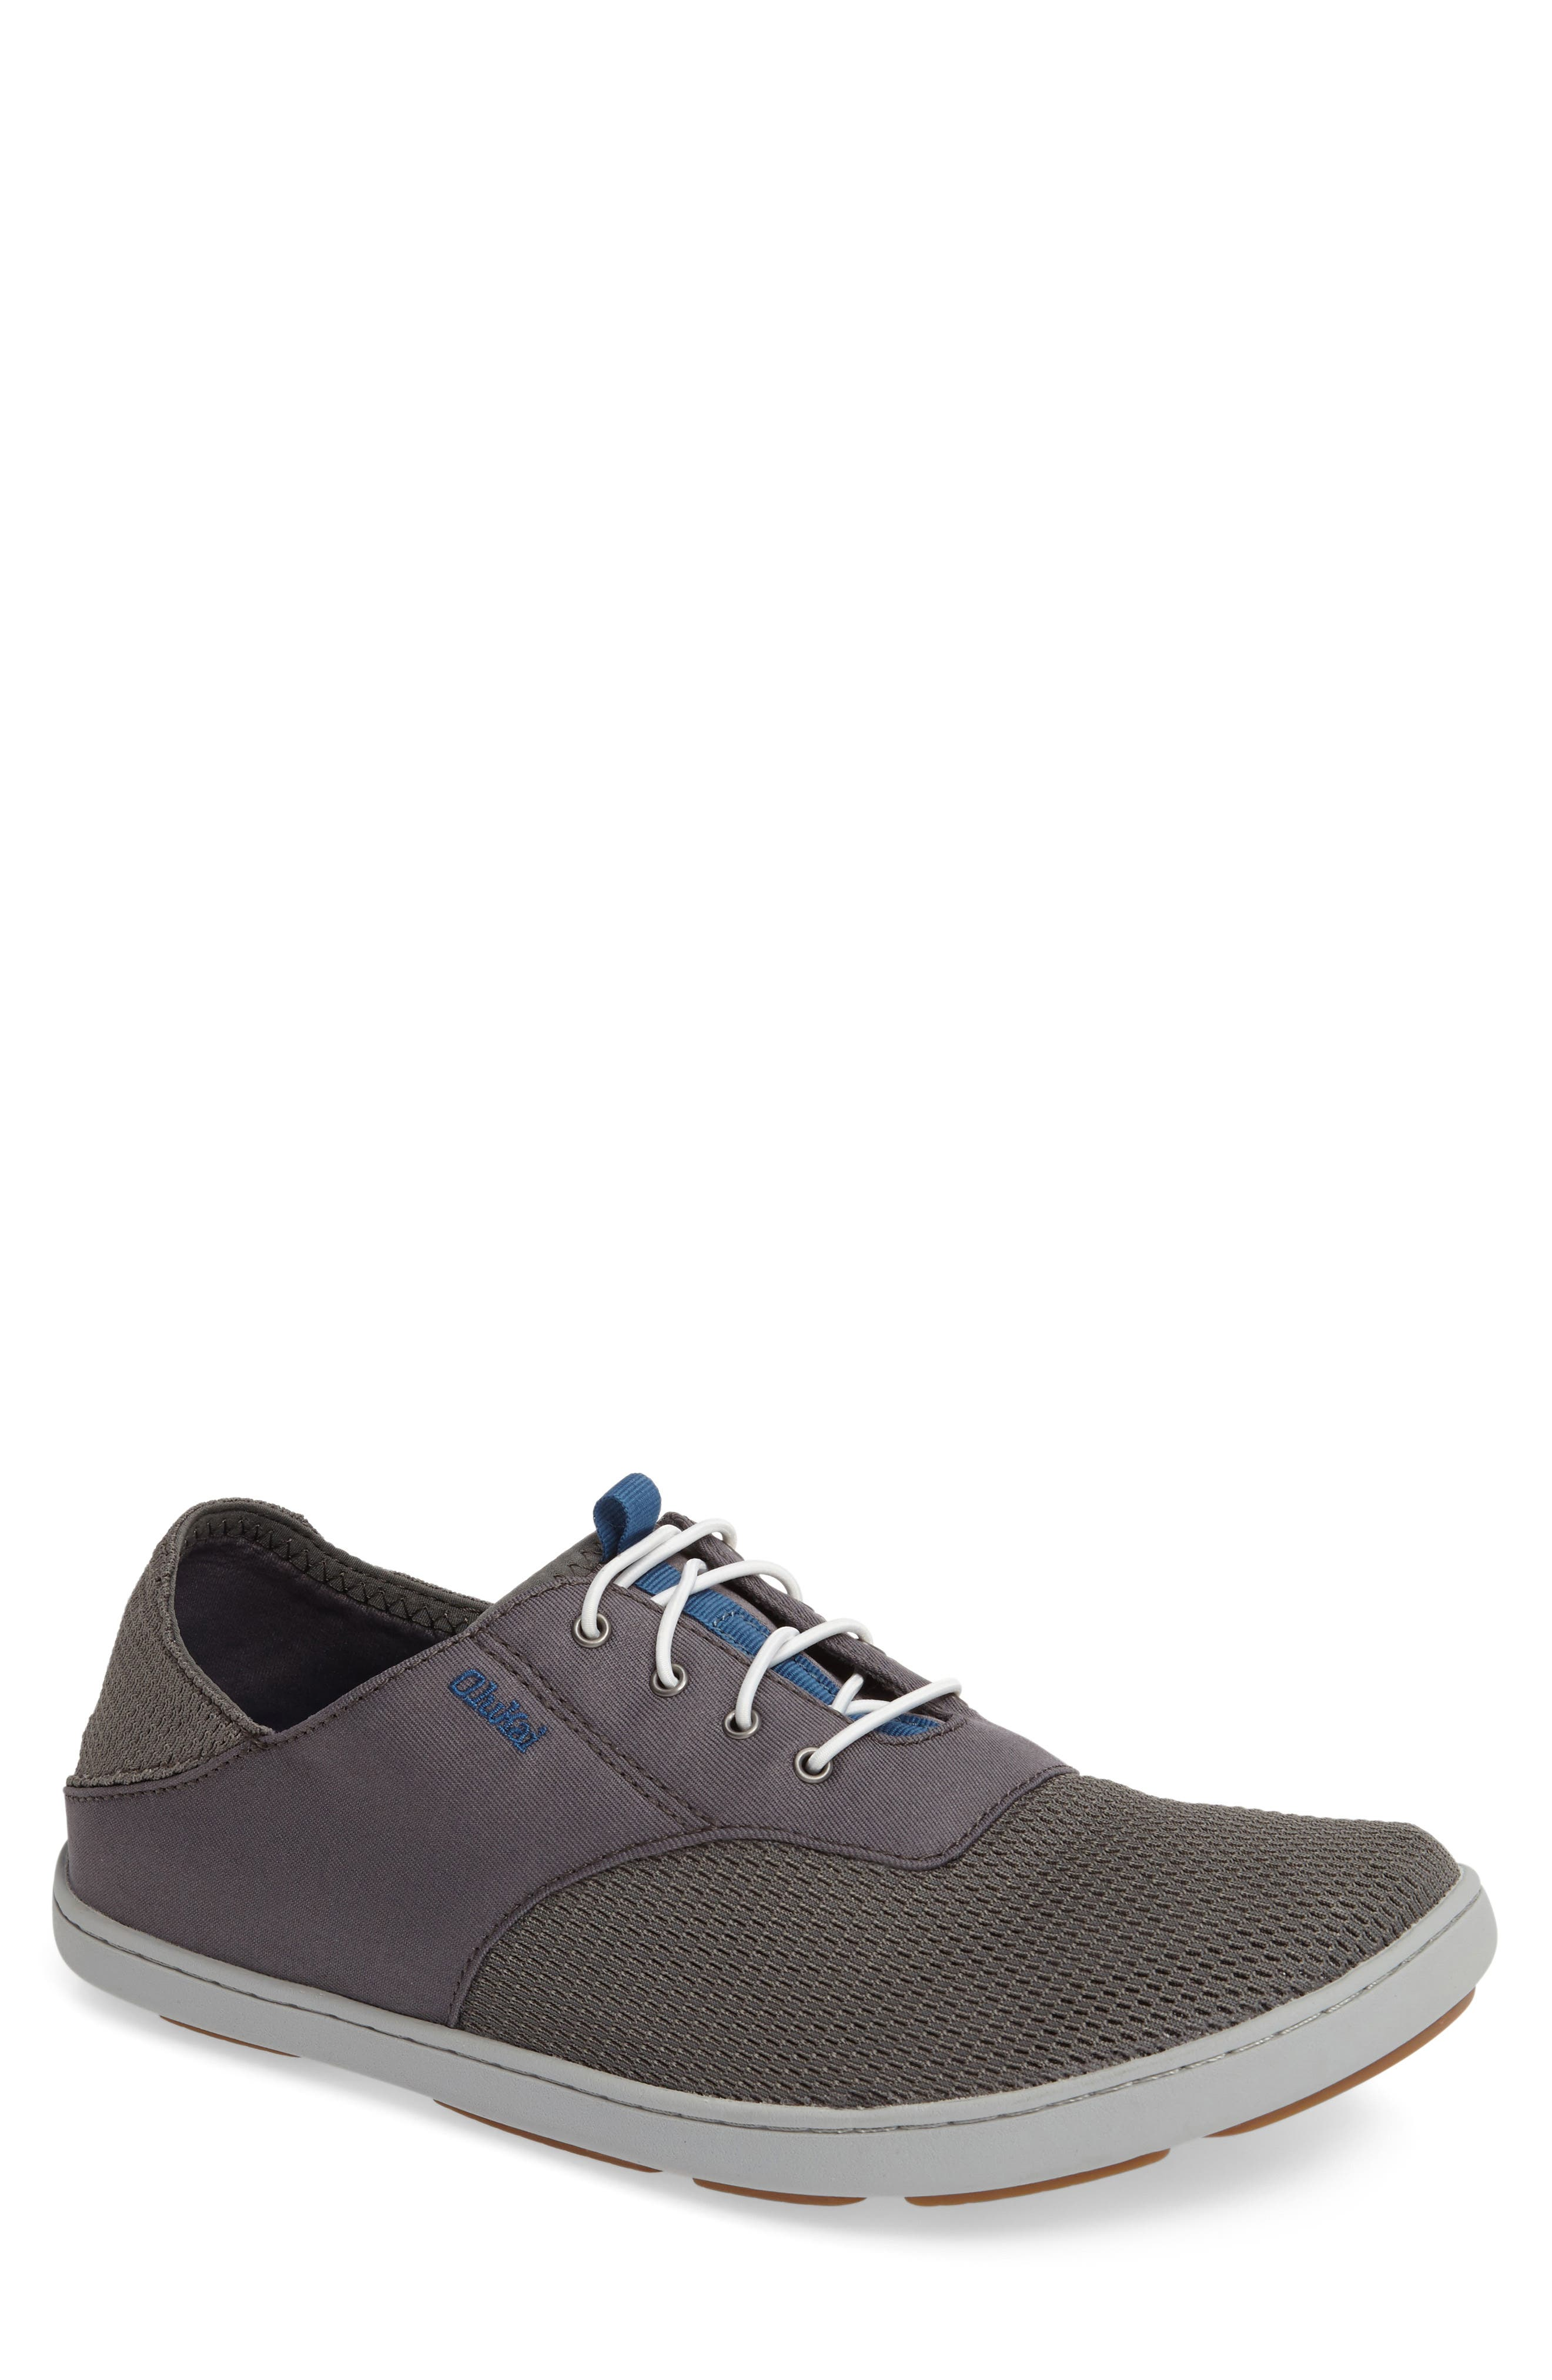 Main Image - OluKai 'Nohea Moku' Sneaker (Men)